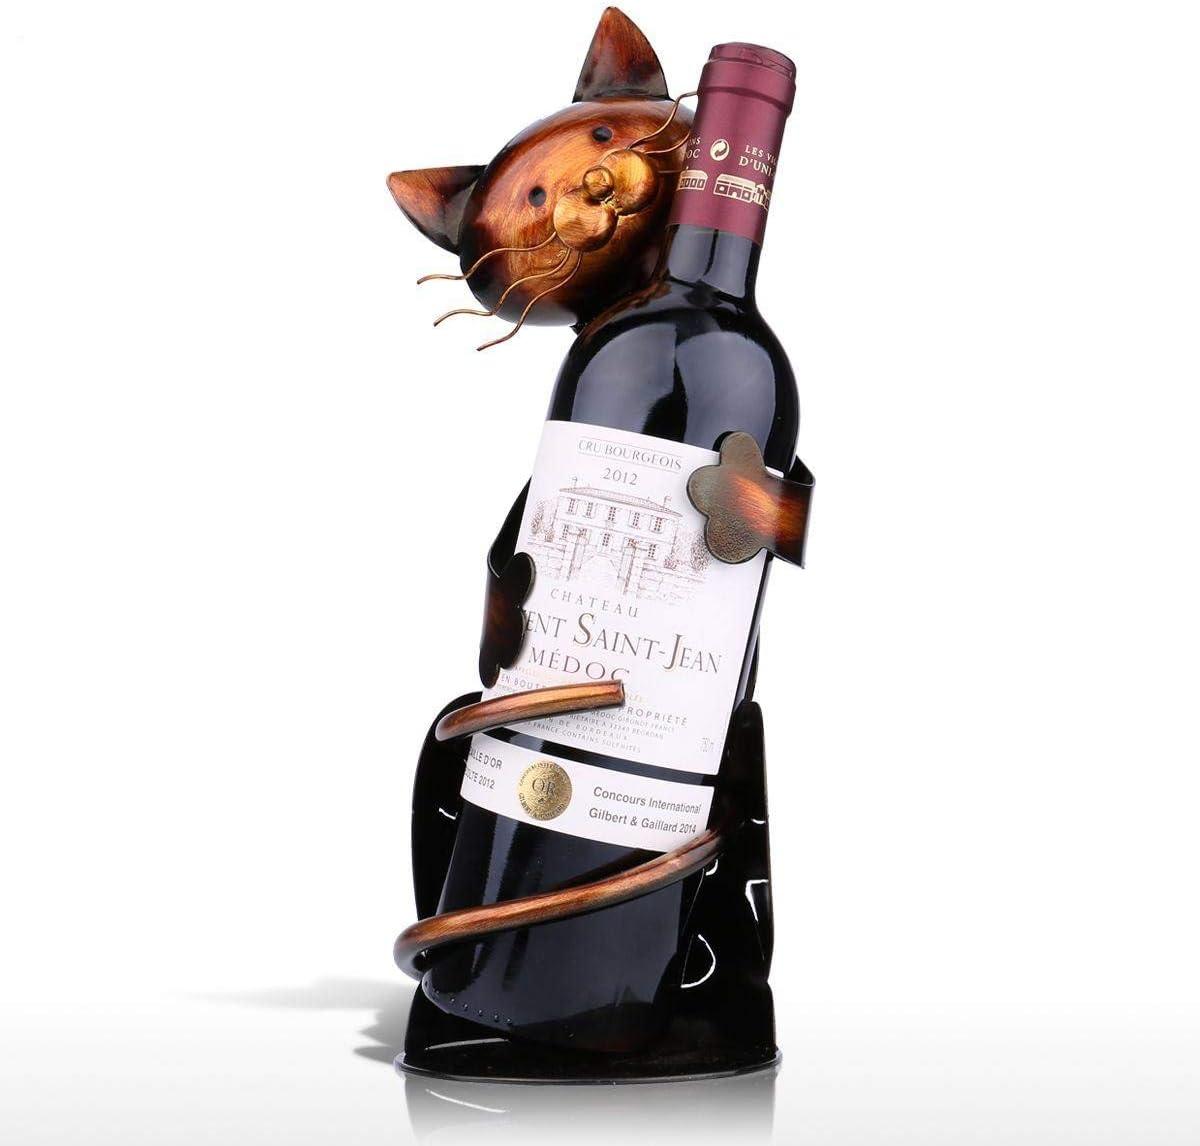 MINLIN Cat Shaped Wine Holder Wine Shelf Metal Figurine Practical Figurine Rack for Wine Bottle Office Home Decor Wine Rack